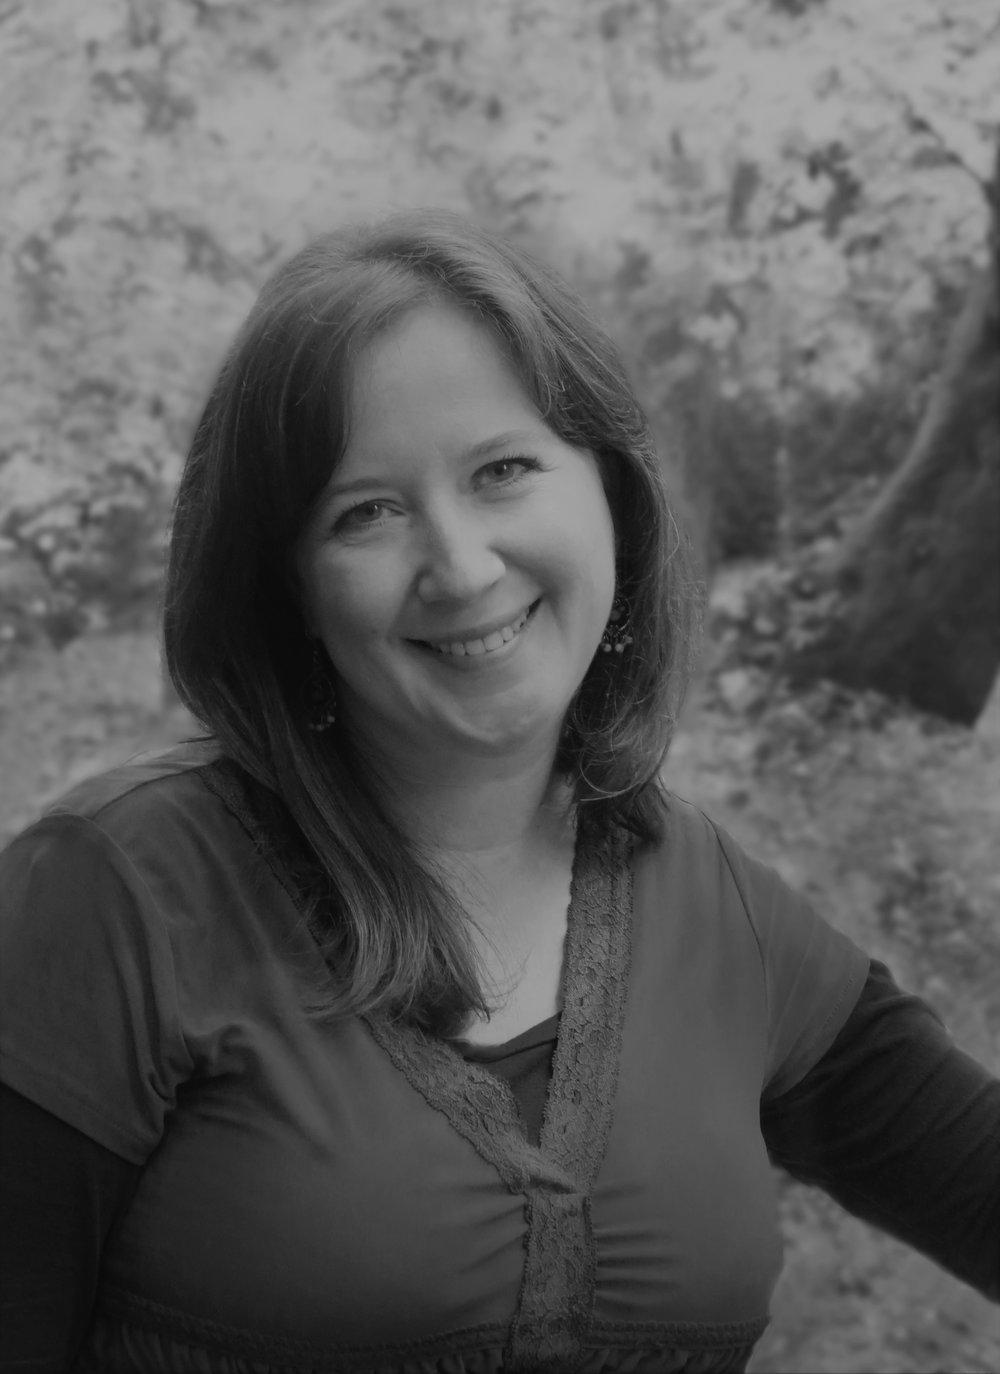 SARA A. MORGAN, MA, LMFTA - Individual, Couple, & Family Therapist